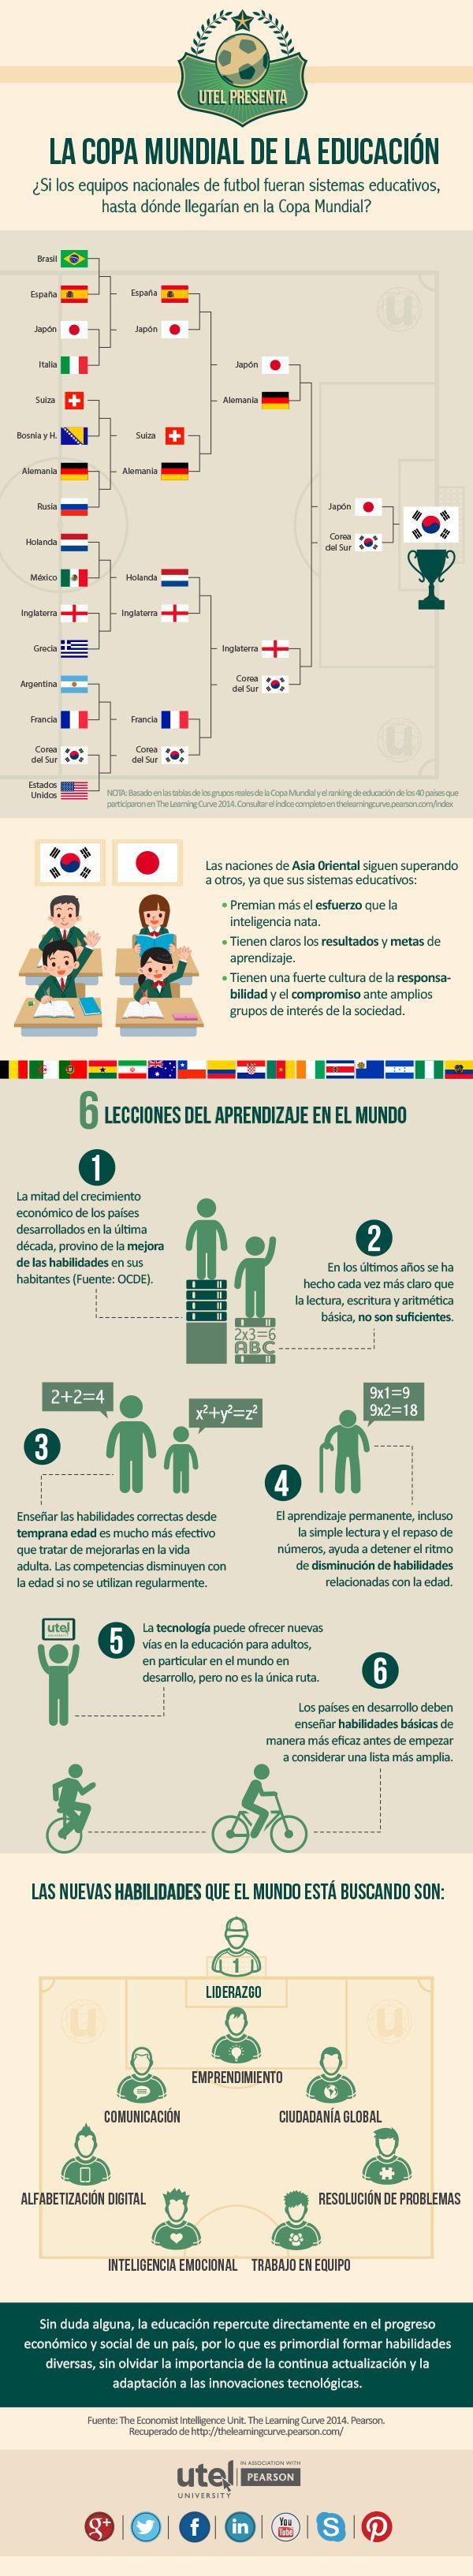 #Infografia #Curiosidades La Copa Mundial de la educación. #TAVnews